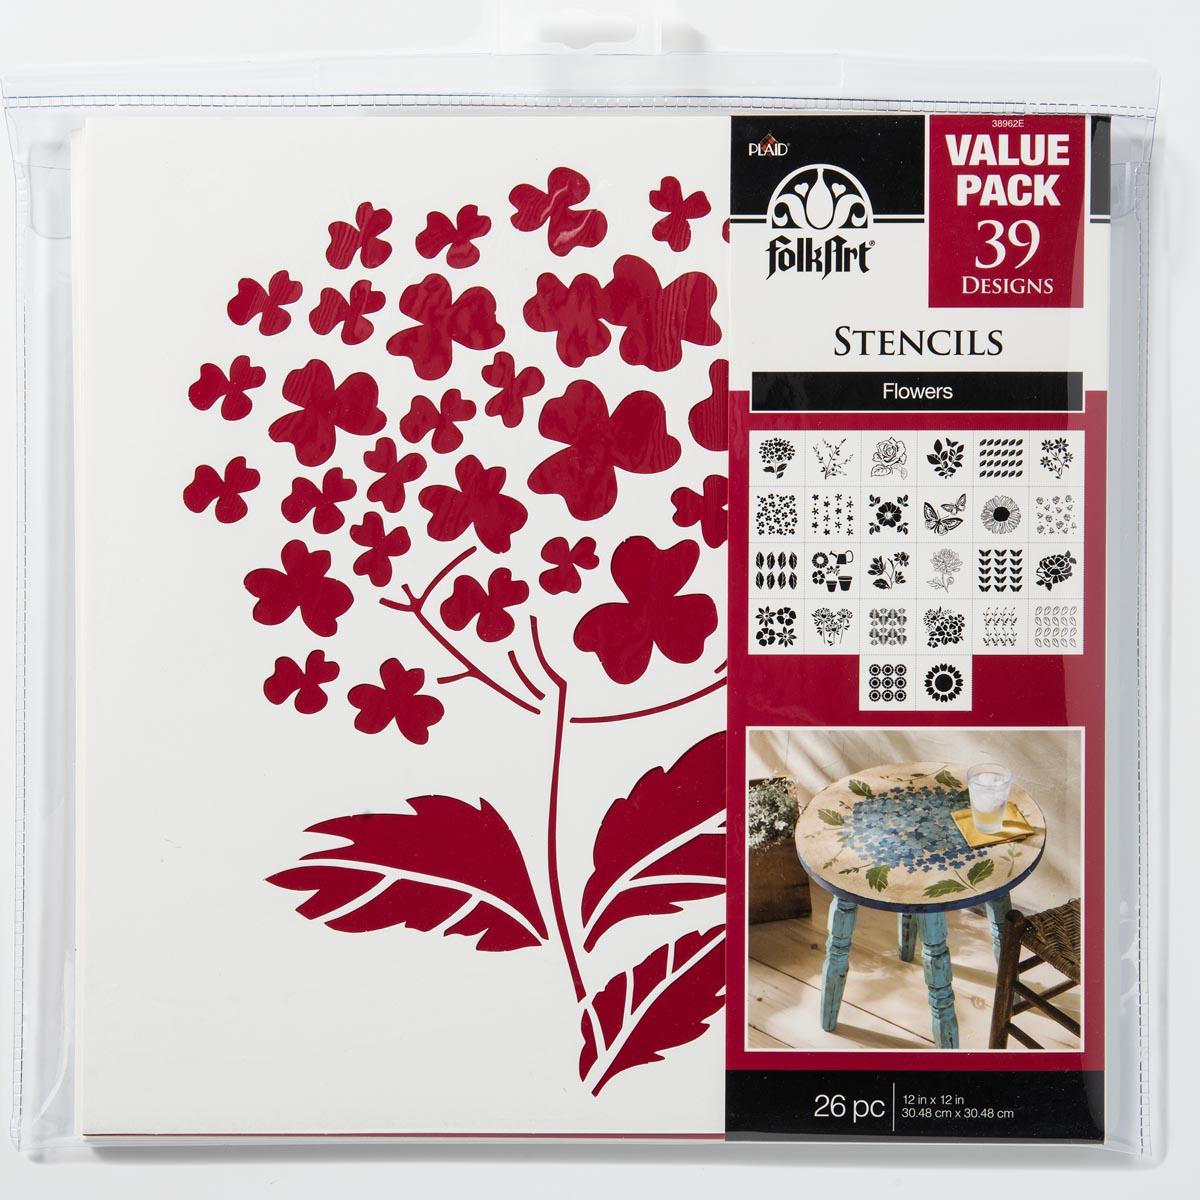 FolkArt ® Stencil Value Packs - Flowers, 12